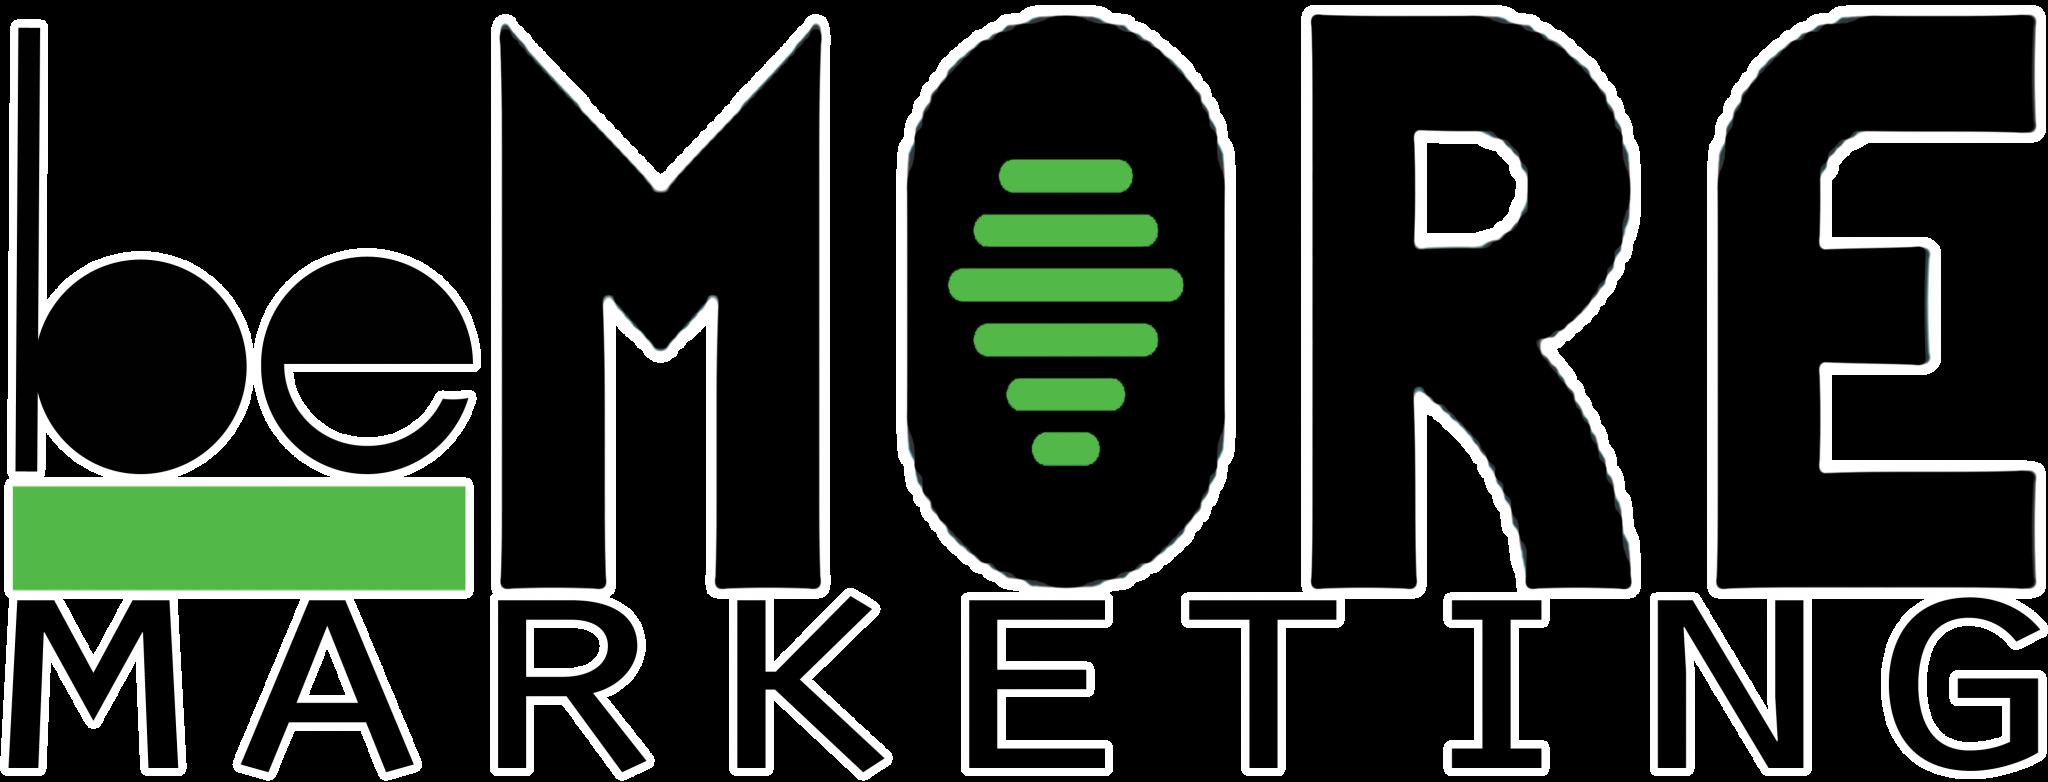 Denver Colorado; beMORE Marketing; Consulting; Agency; SEO; Search Engine Optimization; Website Design; Advertising; Social Media; branding; Graphic Design; Small Business